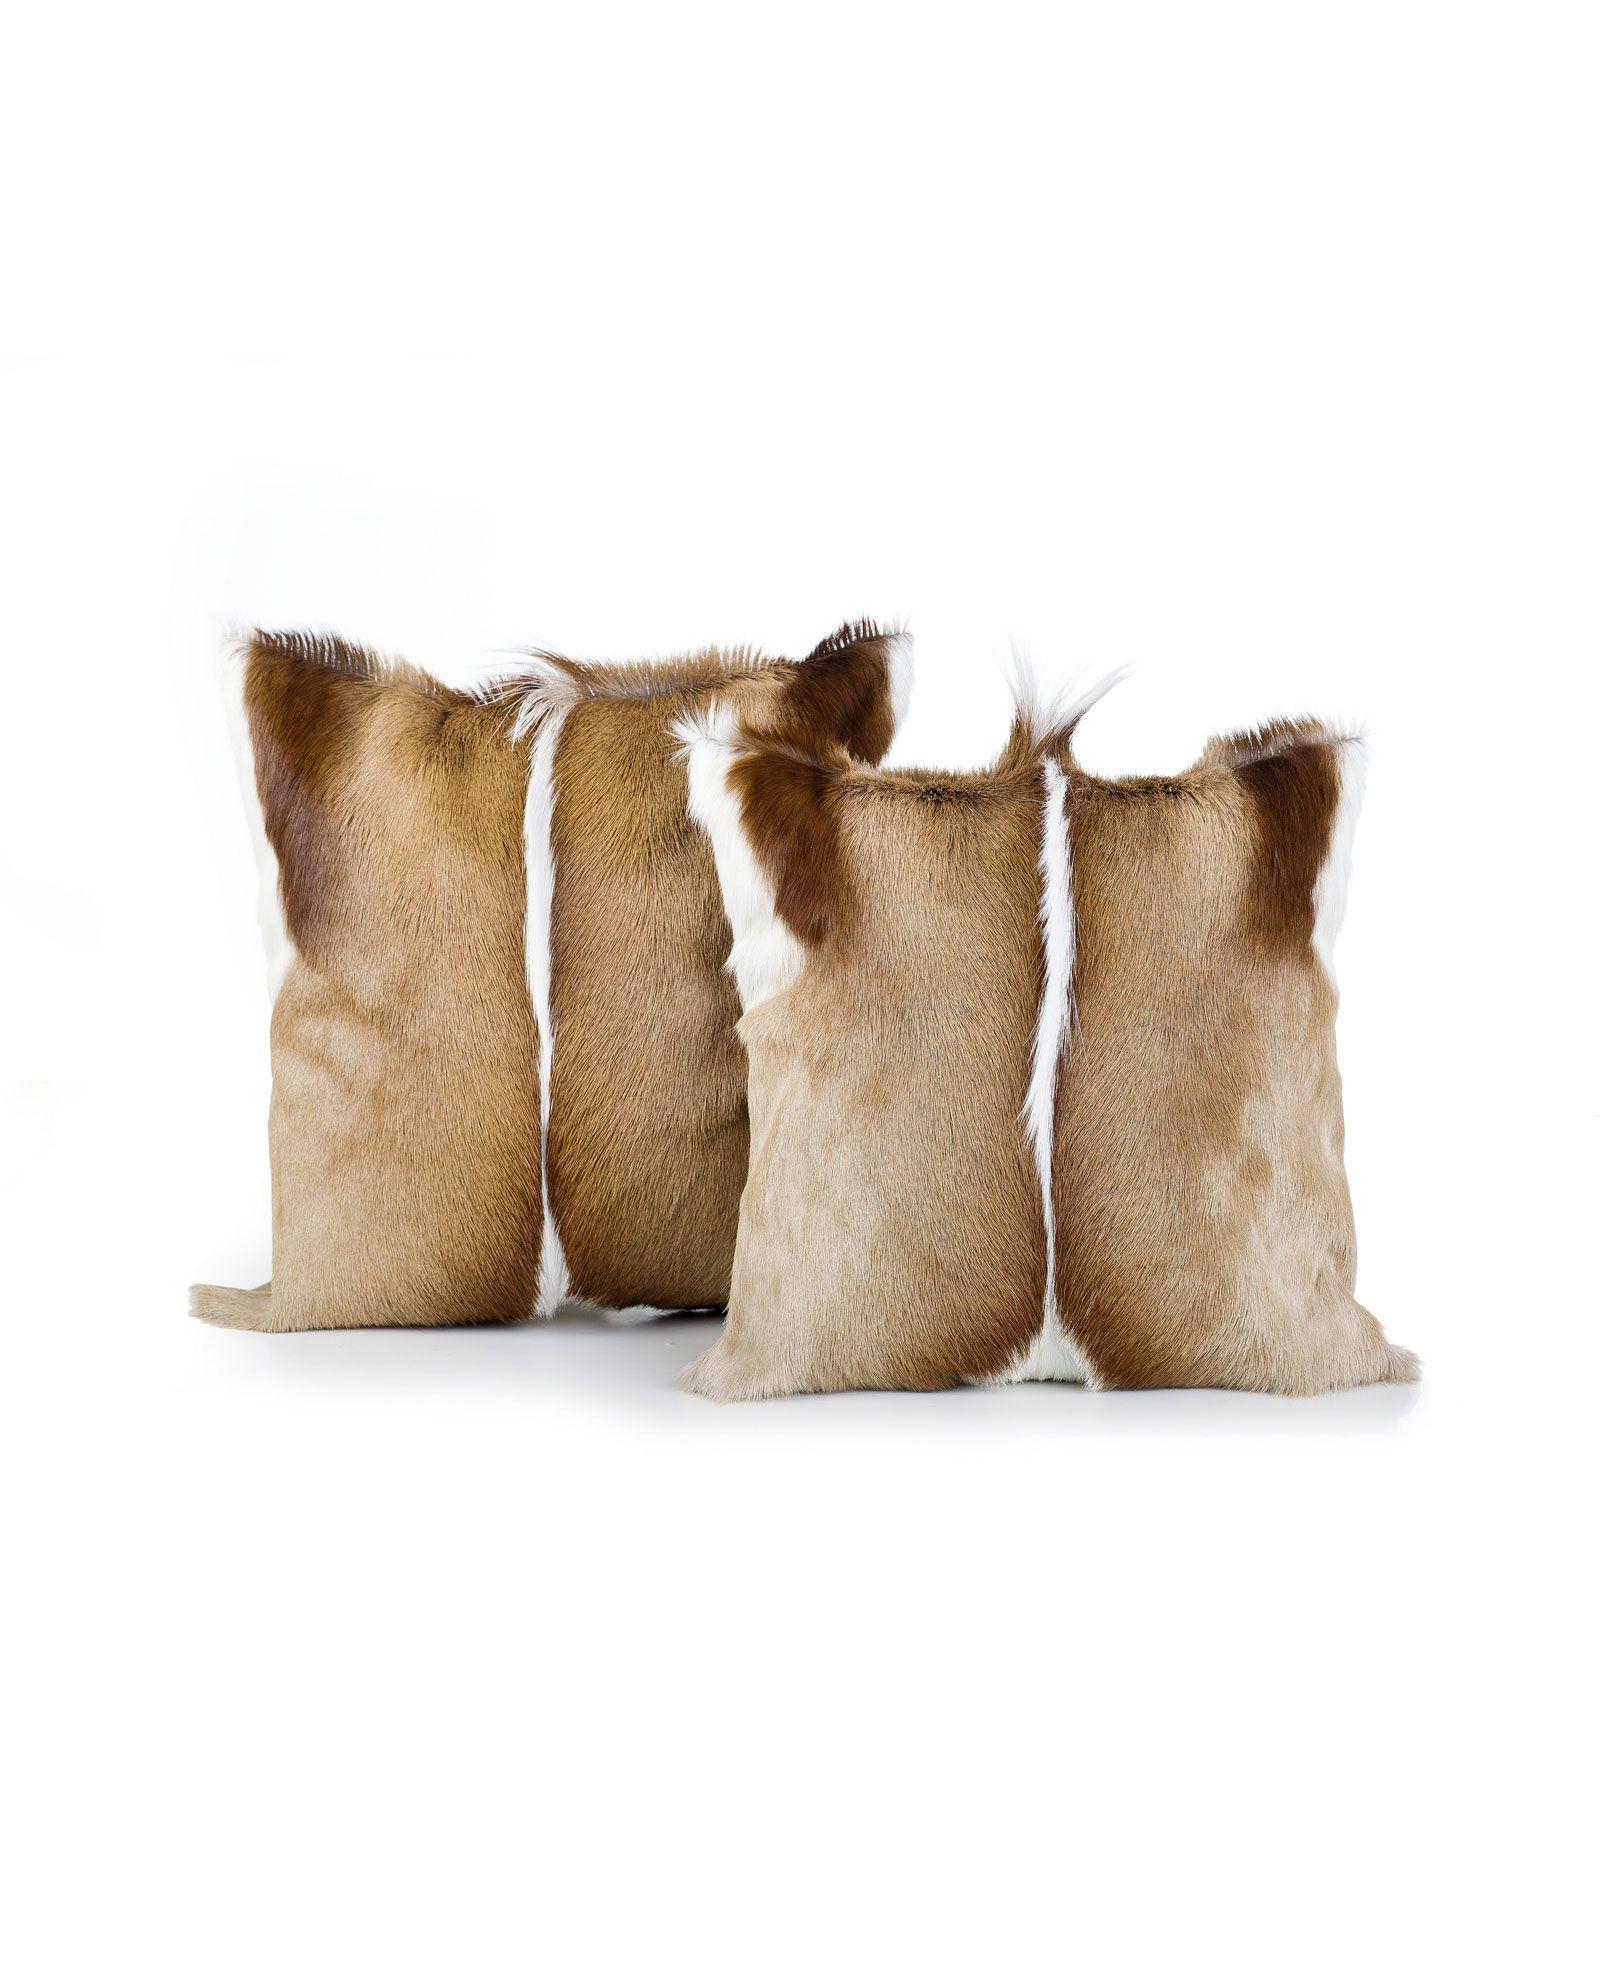 Sukuma Afrika Cushion Cover with Natural Trim. from 2058 ZAR.  Shop online. Ship worldwide.